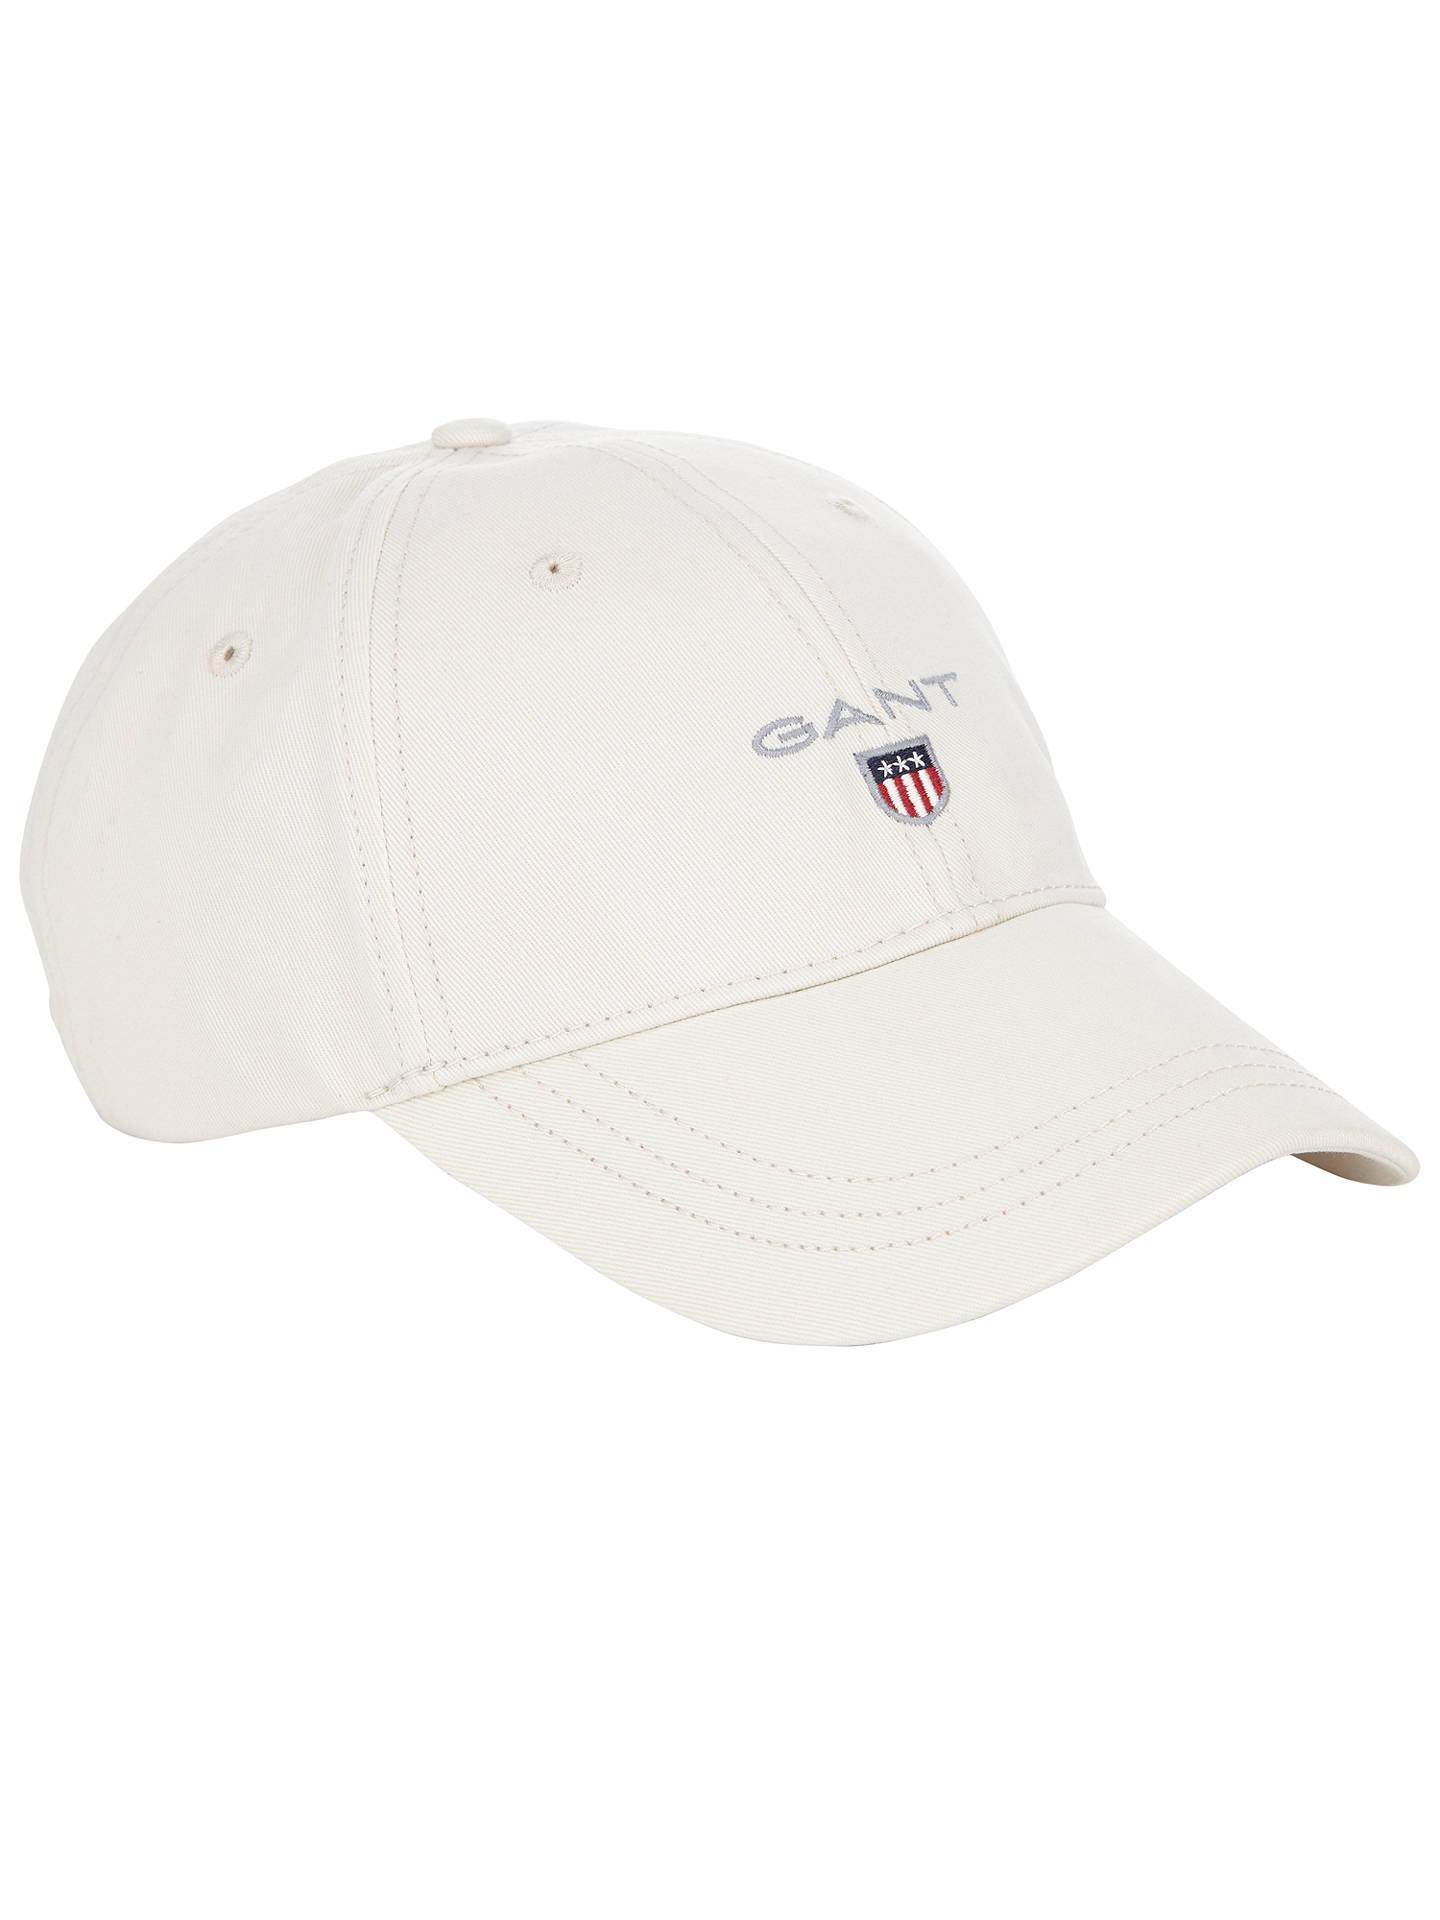 189a37c59b1 Buy Gant Cotton Twill Baseball Cap